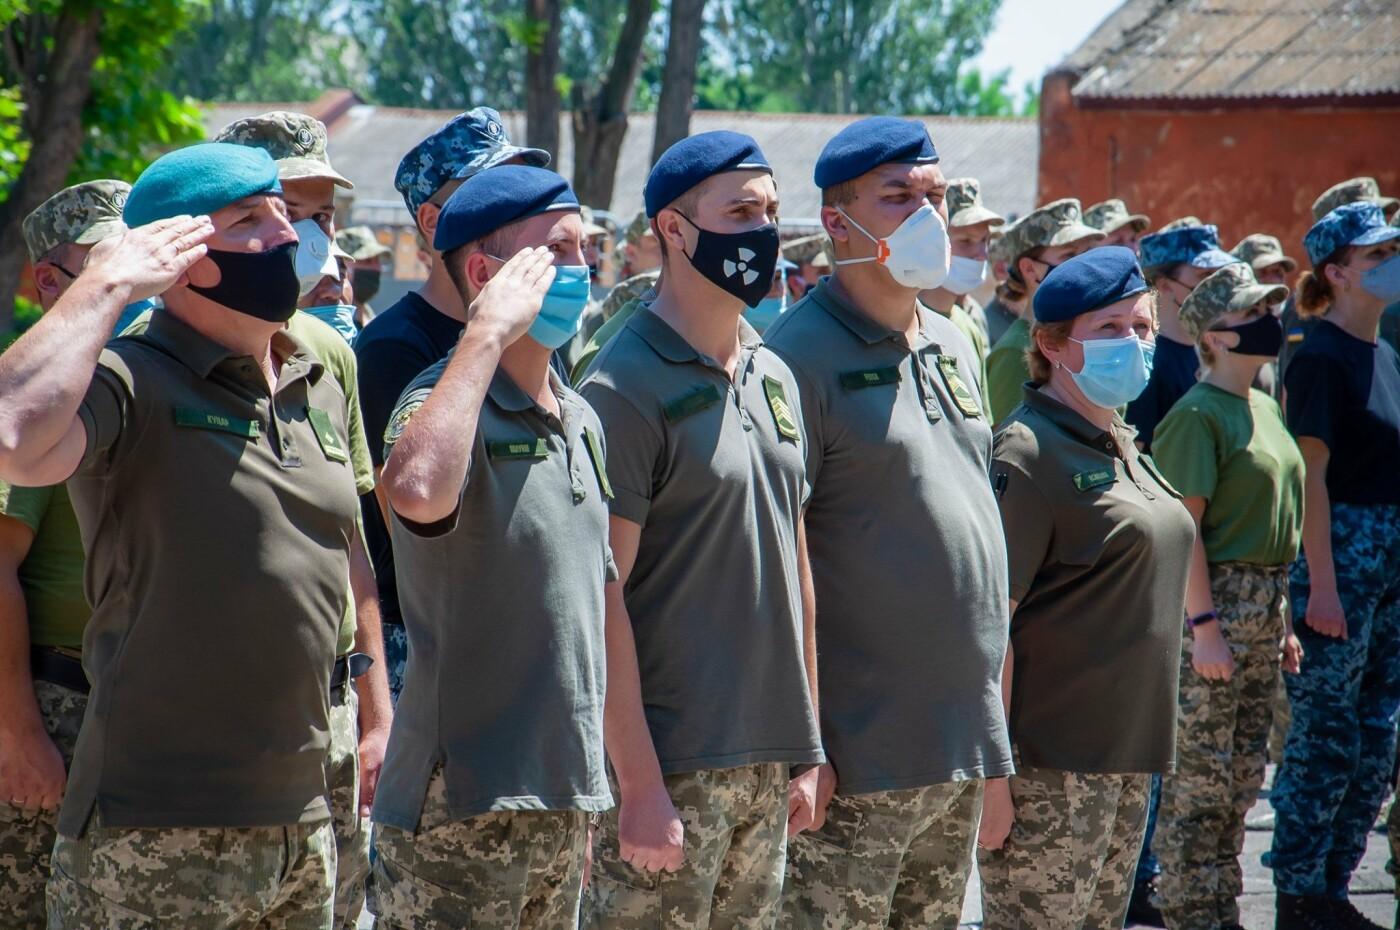 В Николаеве открыли школу морского пехотинца на базе учебного центра ВМФ, фото-4